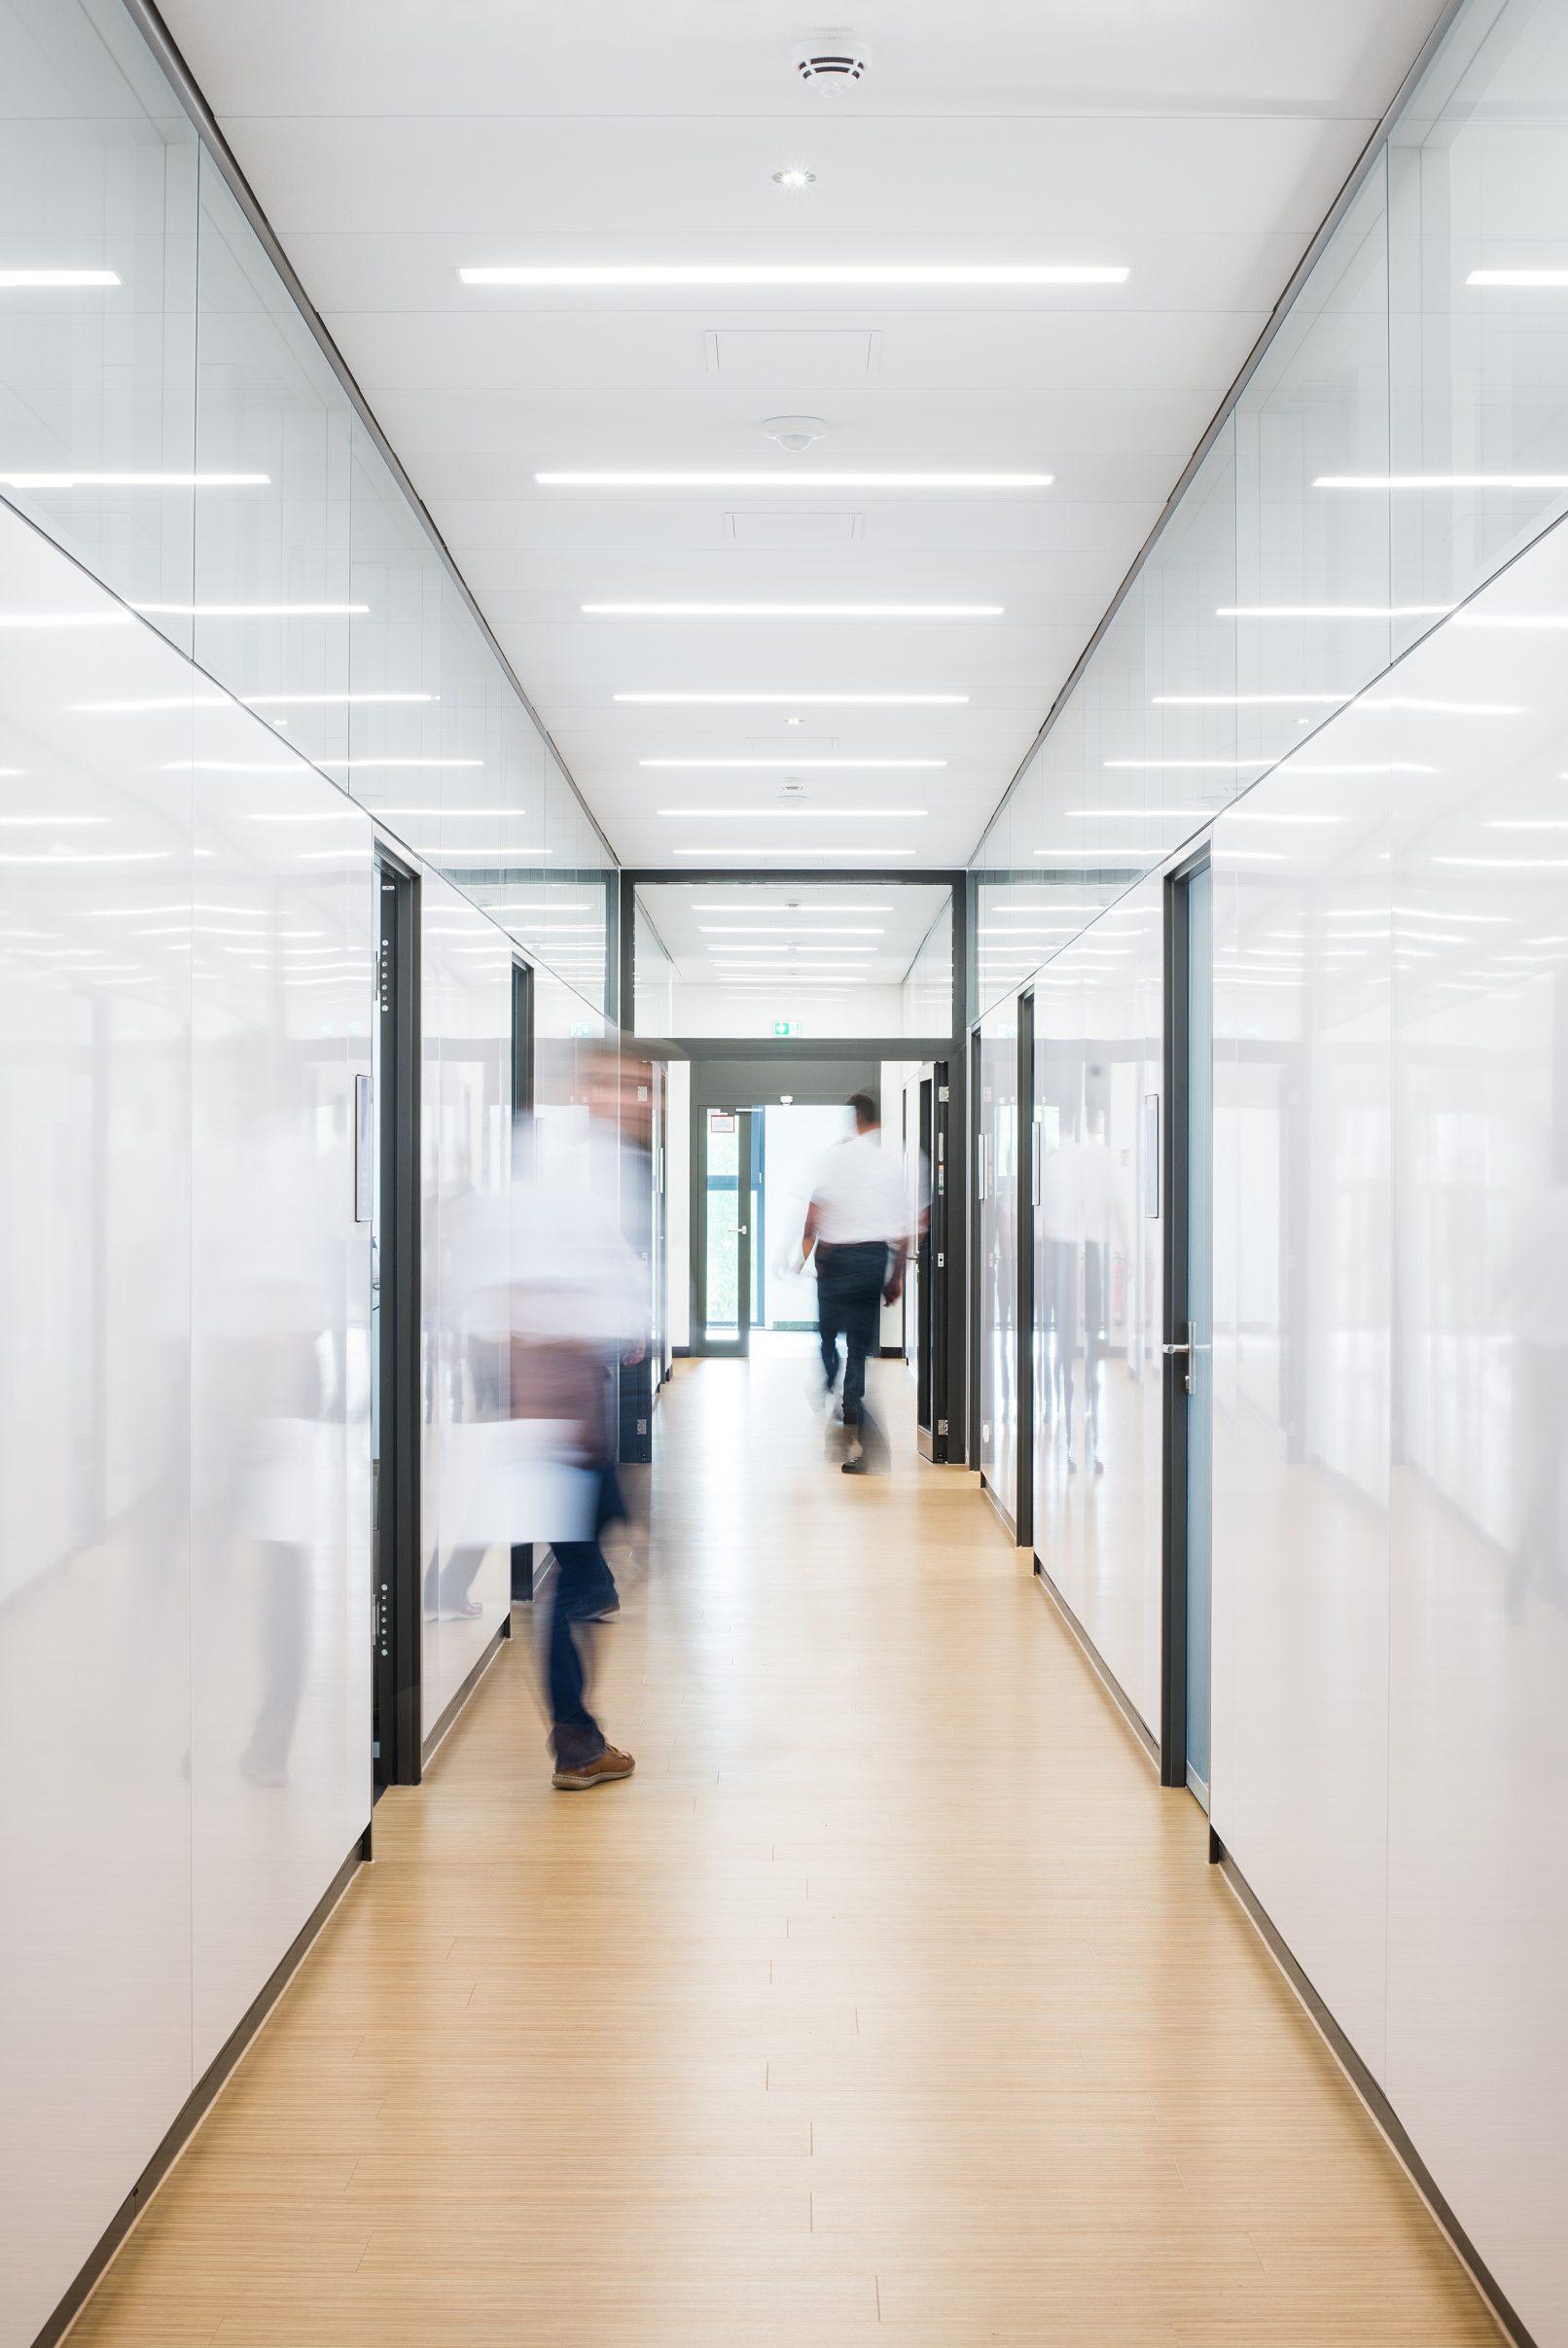 Innenarchitektur Kiel innenarchitektur filipinski